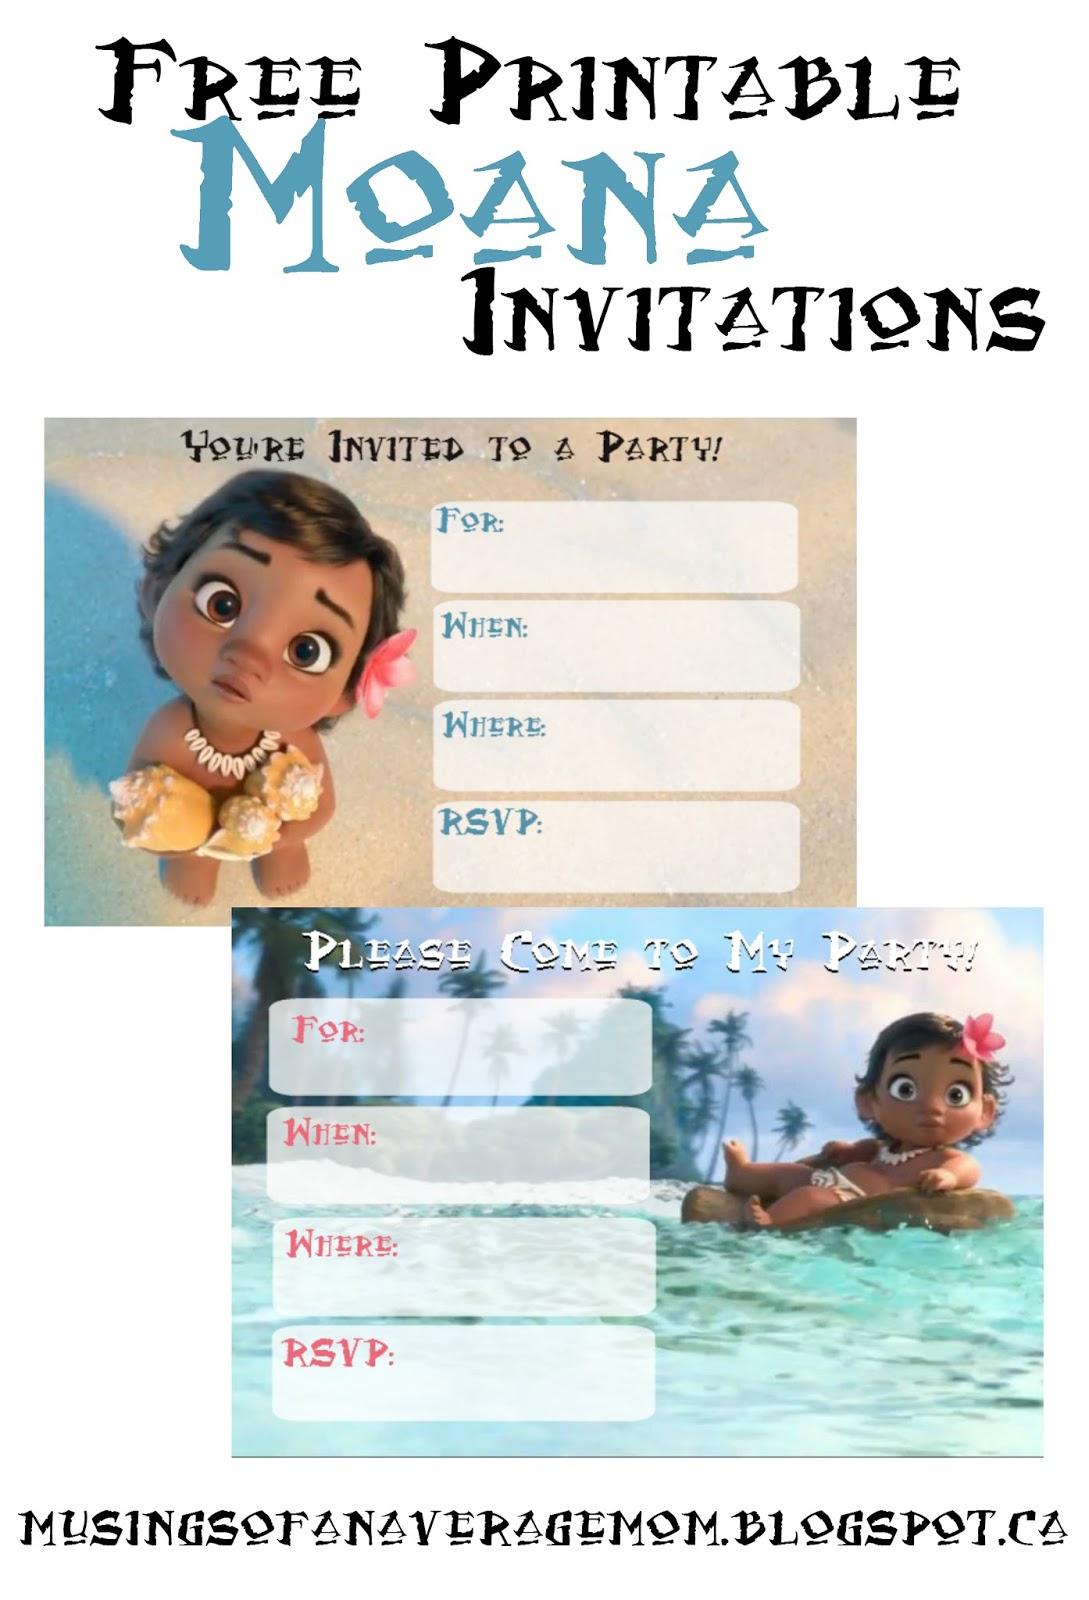 Musings Of An Average Mom: Free Printable Moana Invitations - Free Moana Printable Invitations